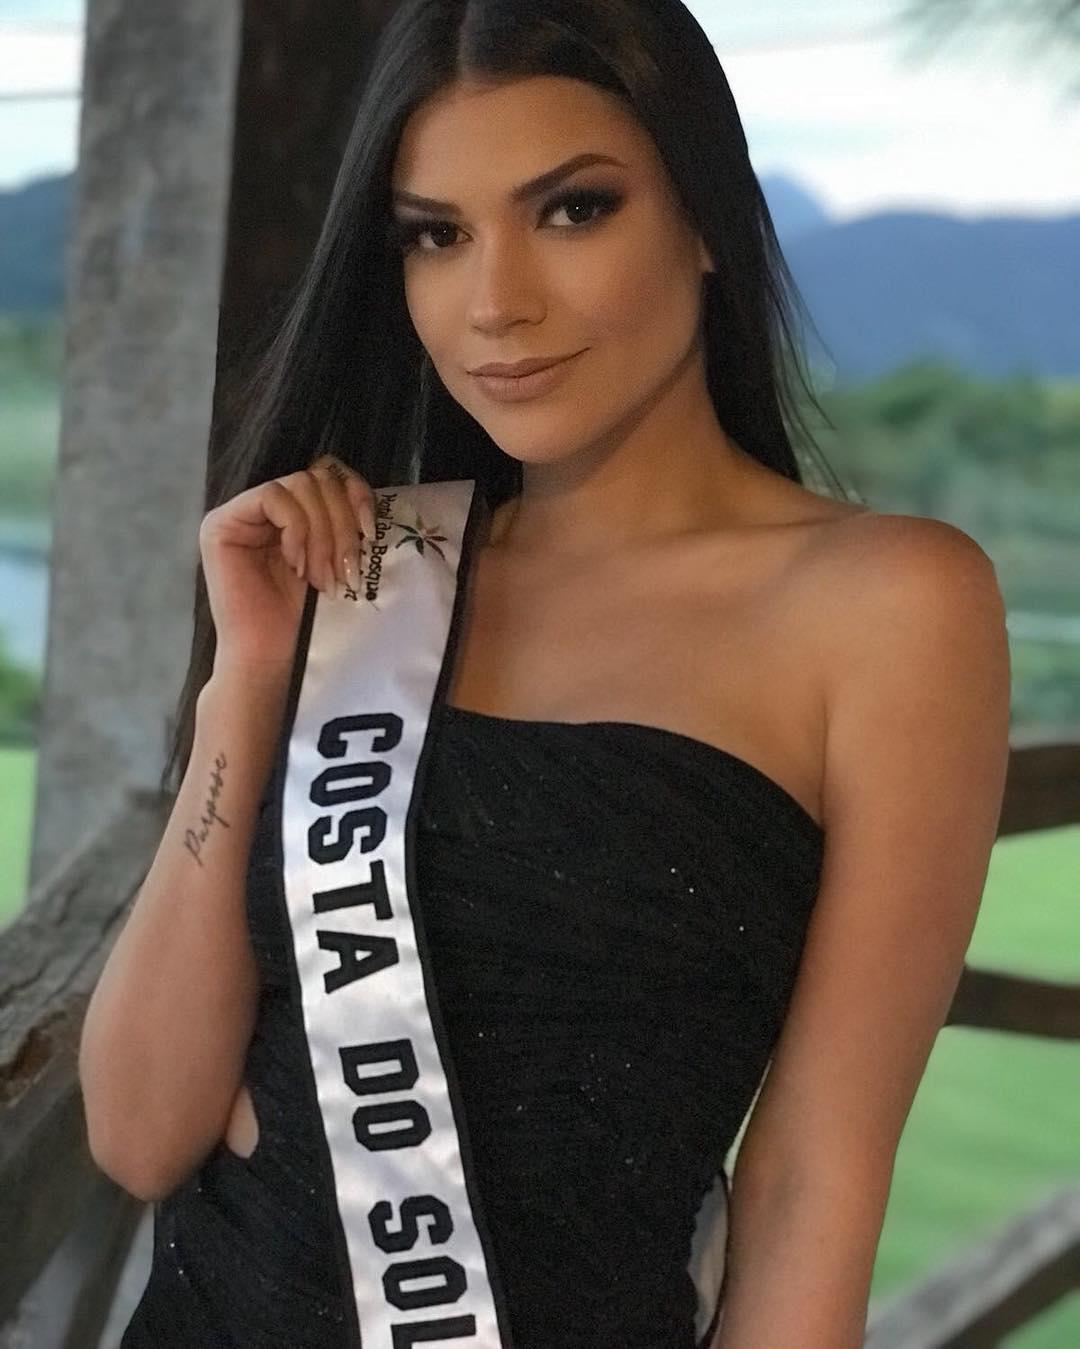 gleycy correia, miss brasil continentes unidos 2018. - Página 3 38147610